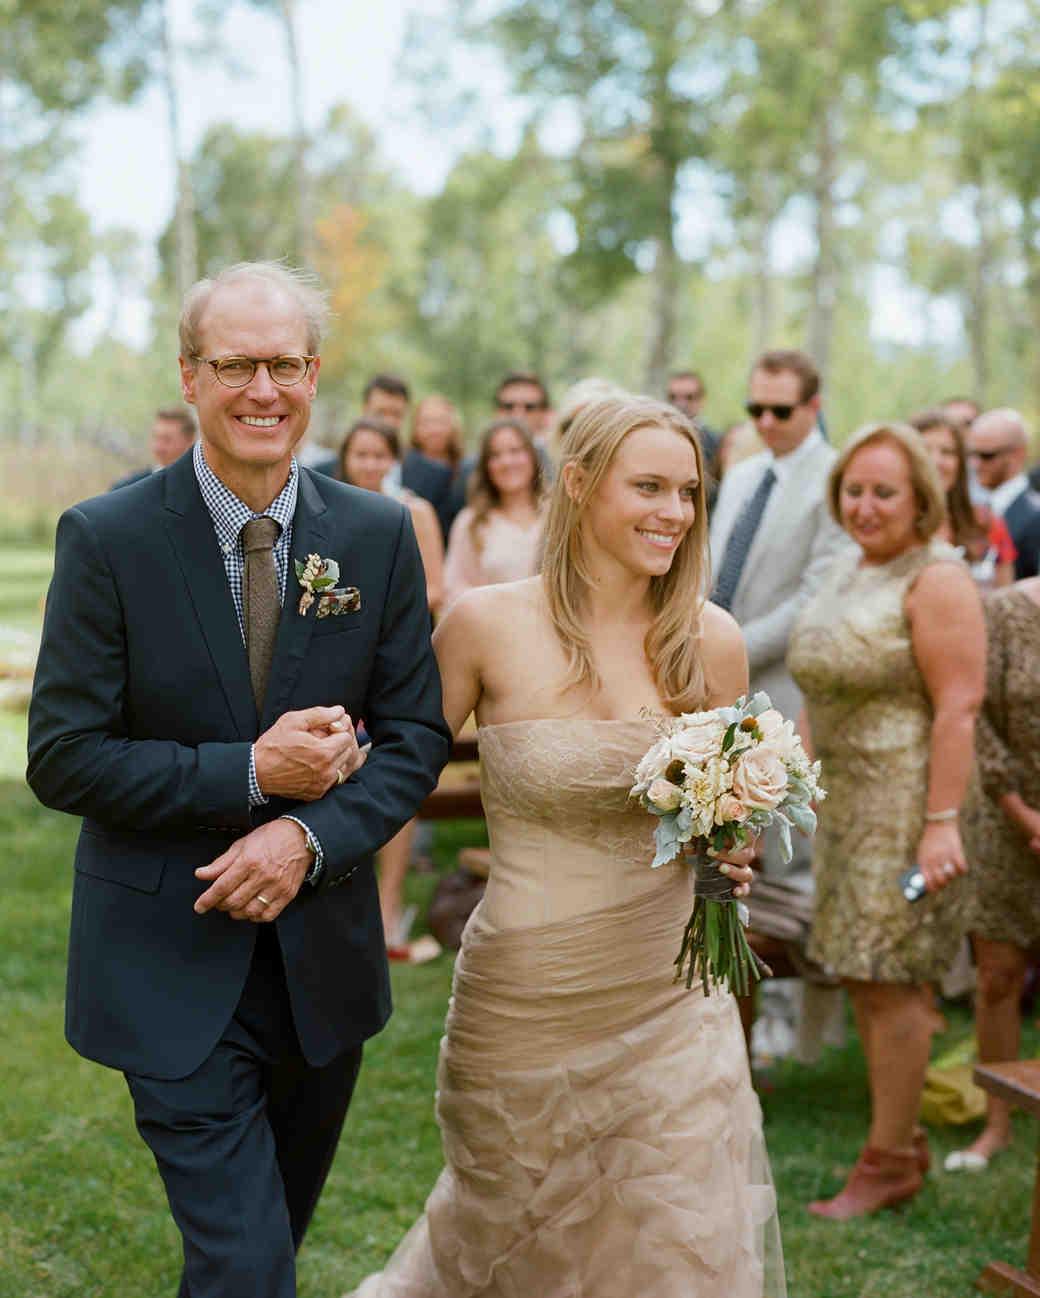 callie-eric-wedding-dad-354-s112113-0815.jpg